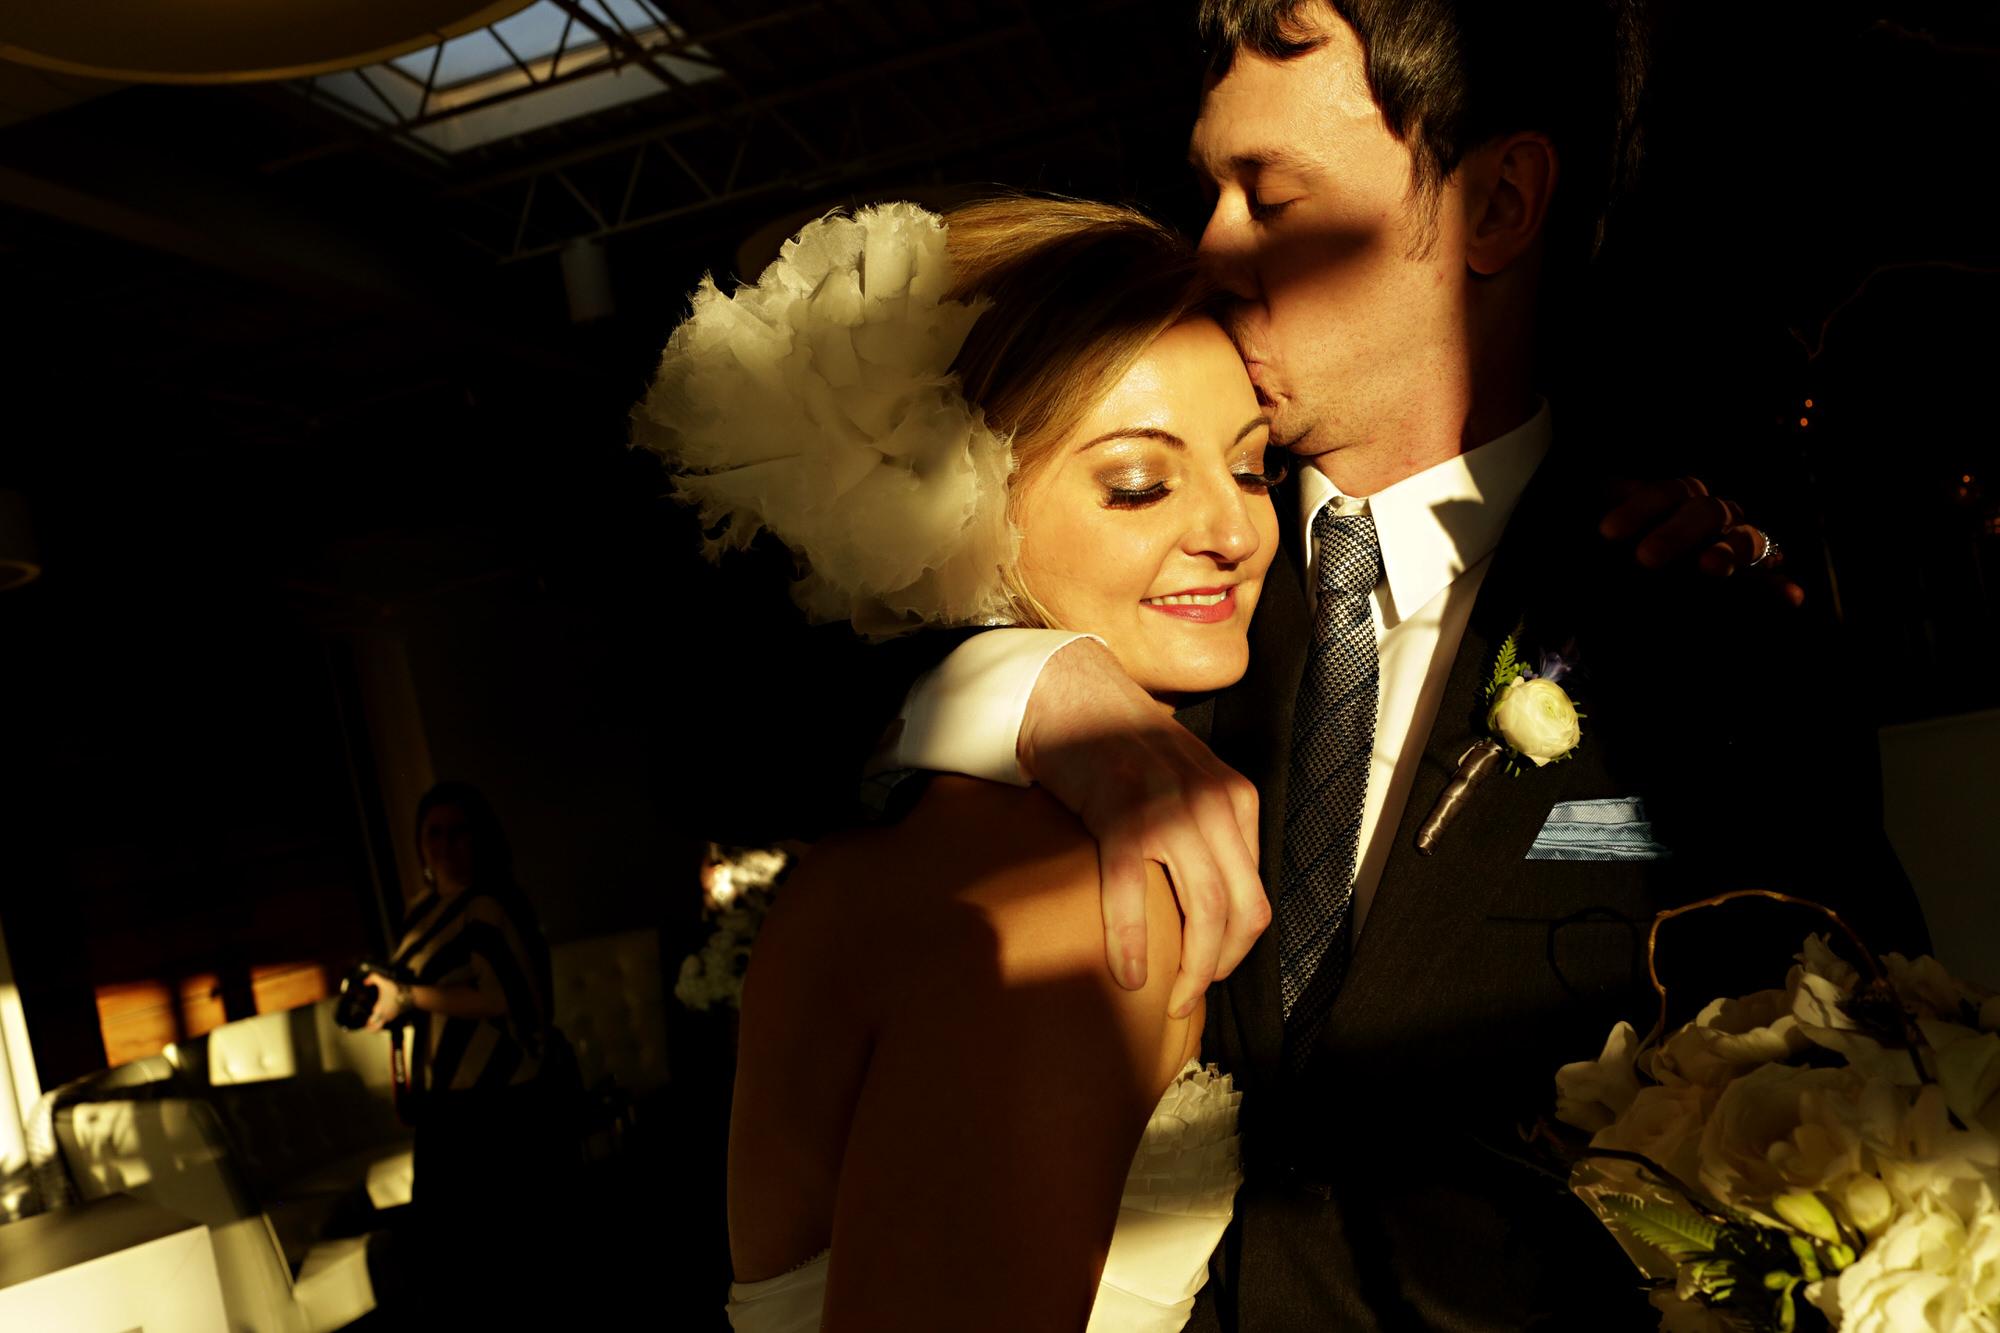 Dappled light photo of bride and groom by Tyler Wirken - Kansas City